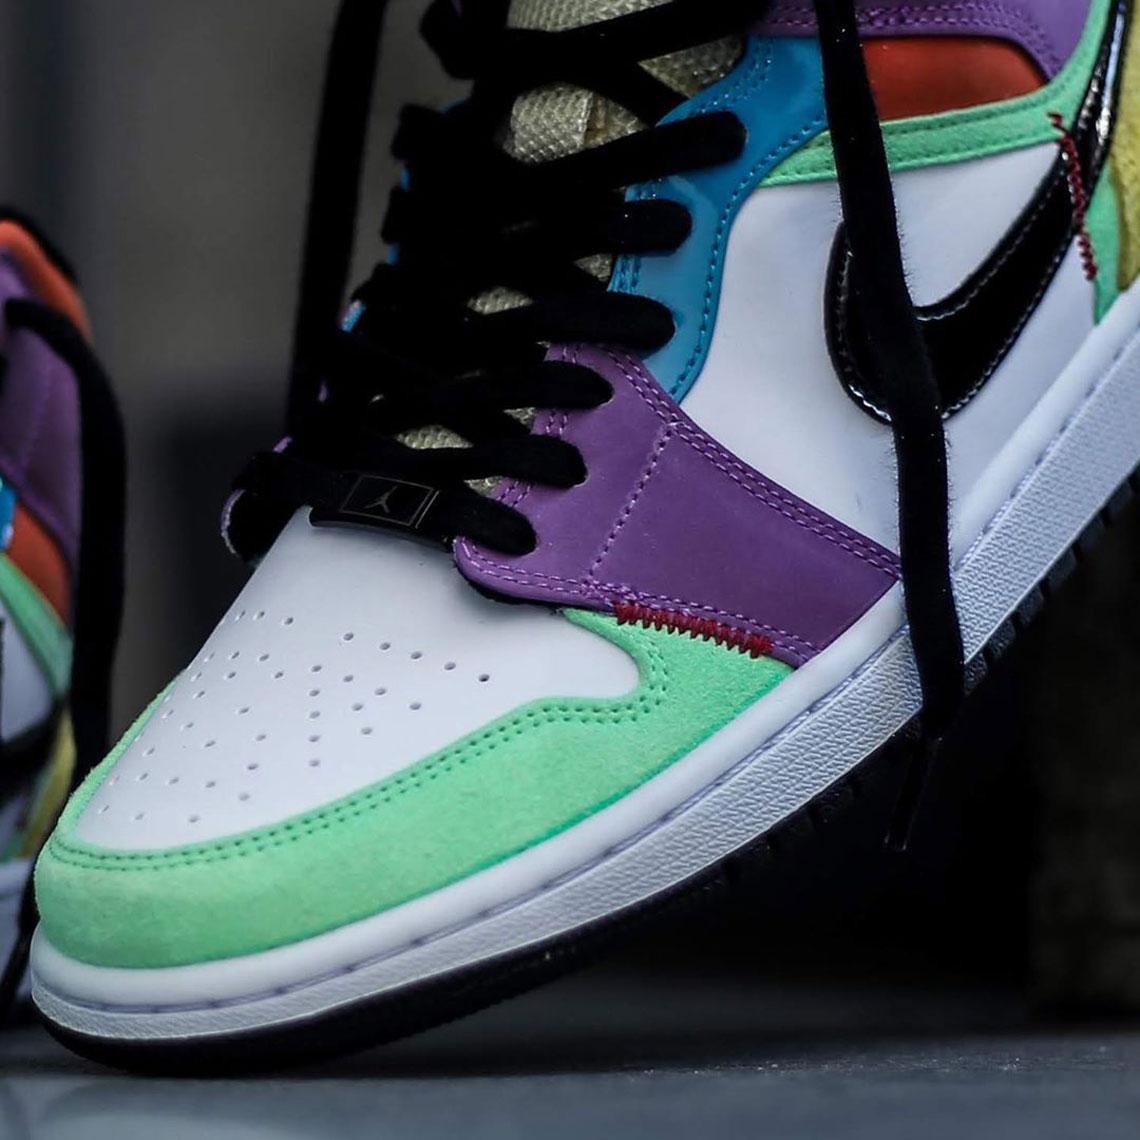 Air Jordan 1 Mid Se Lightbulb Multicolor Release Date